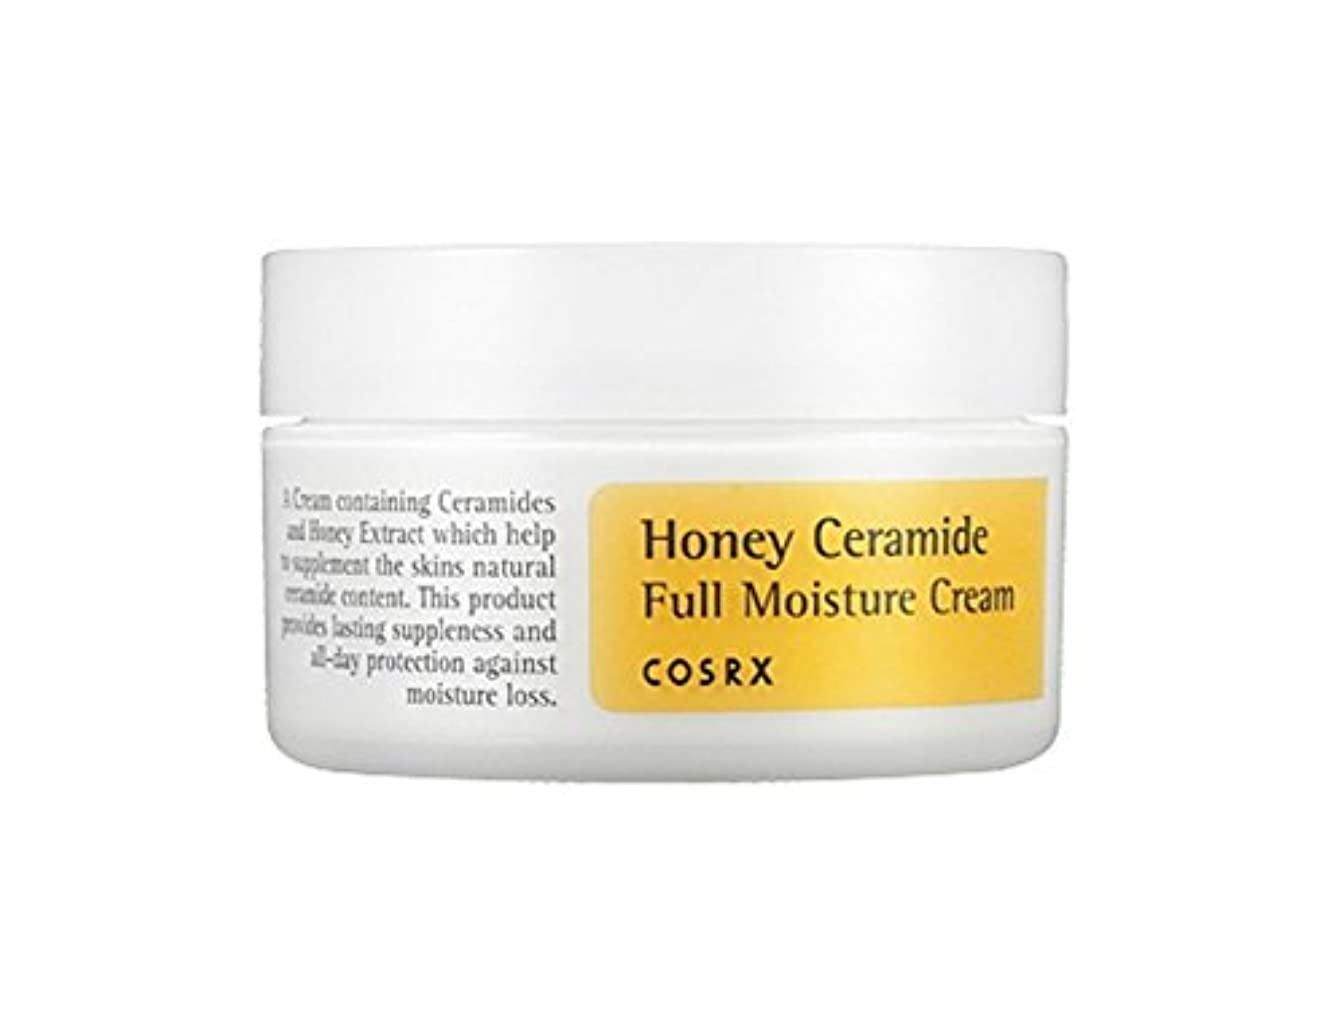 COSRX Honey Ceramide Full Moisture Cream 50ml/COSRX ハニー セラミド フル モイスチャー クリーム 50ml [並行輸入品]